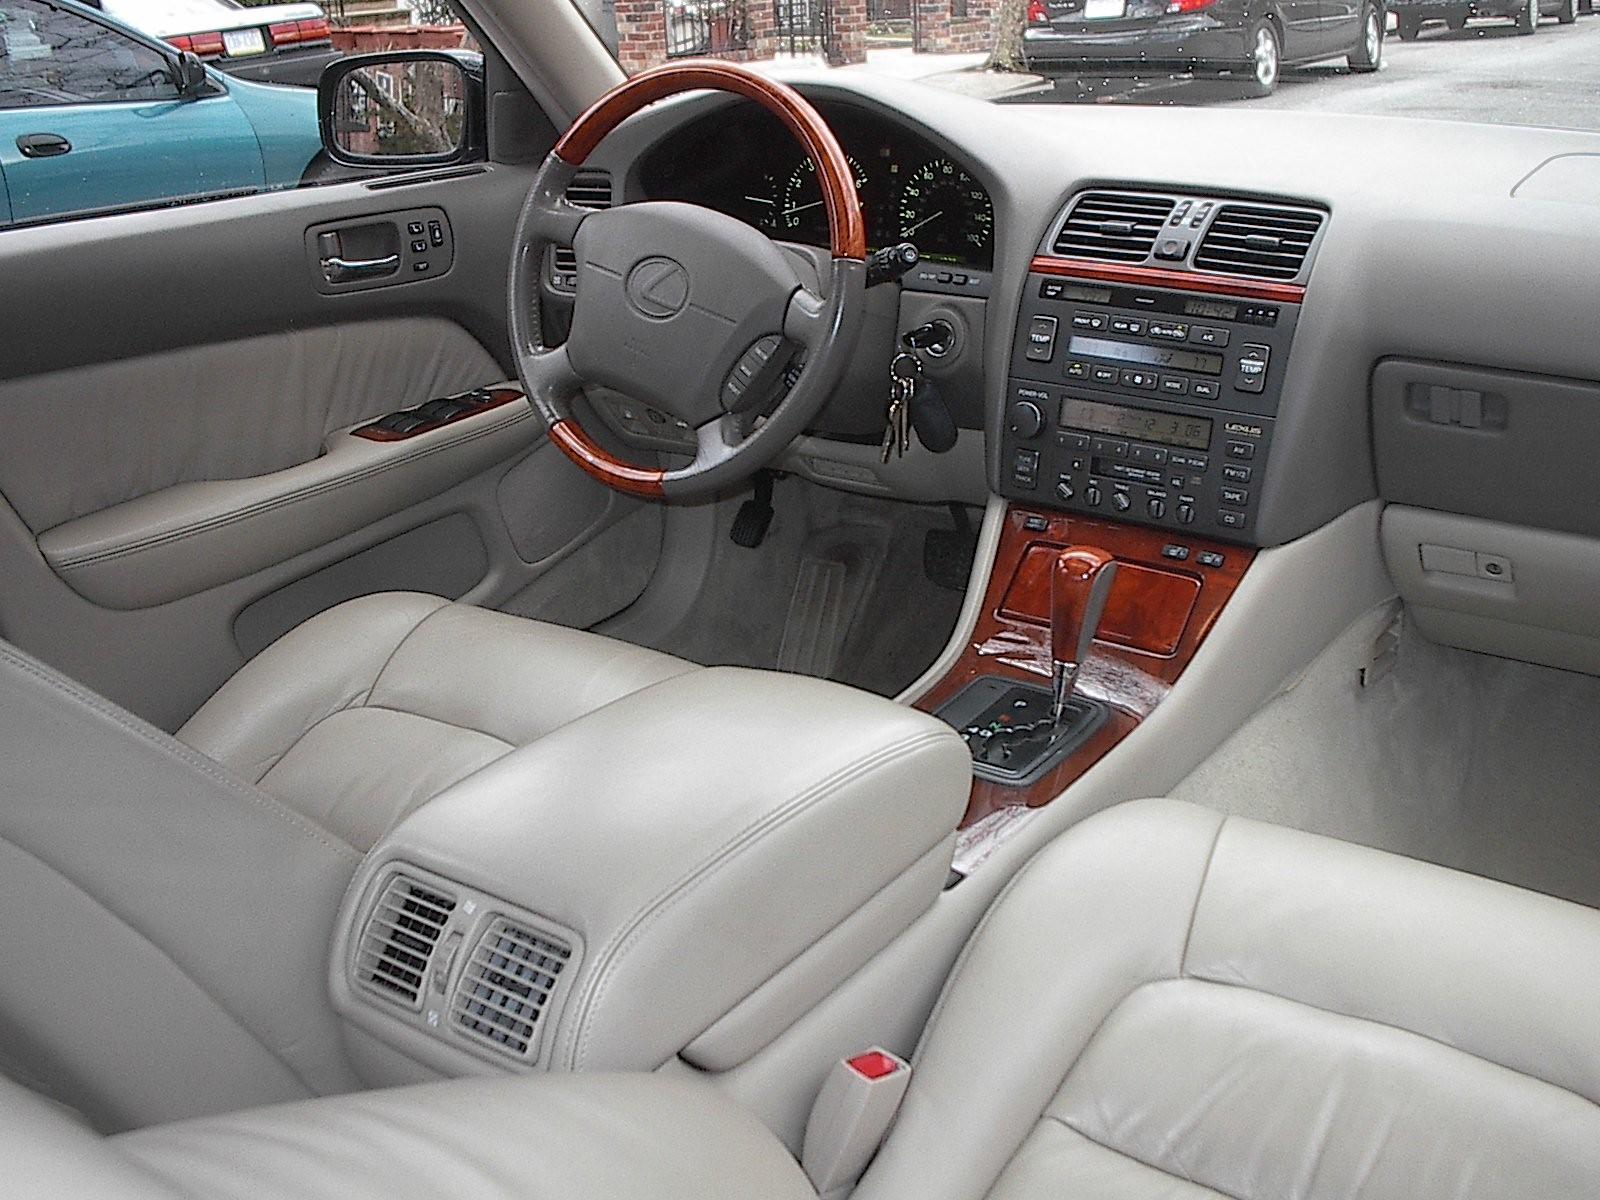 File:Lexus LS 400 model year 2000 interior.jpg - Wikimedia ...